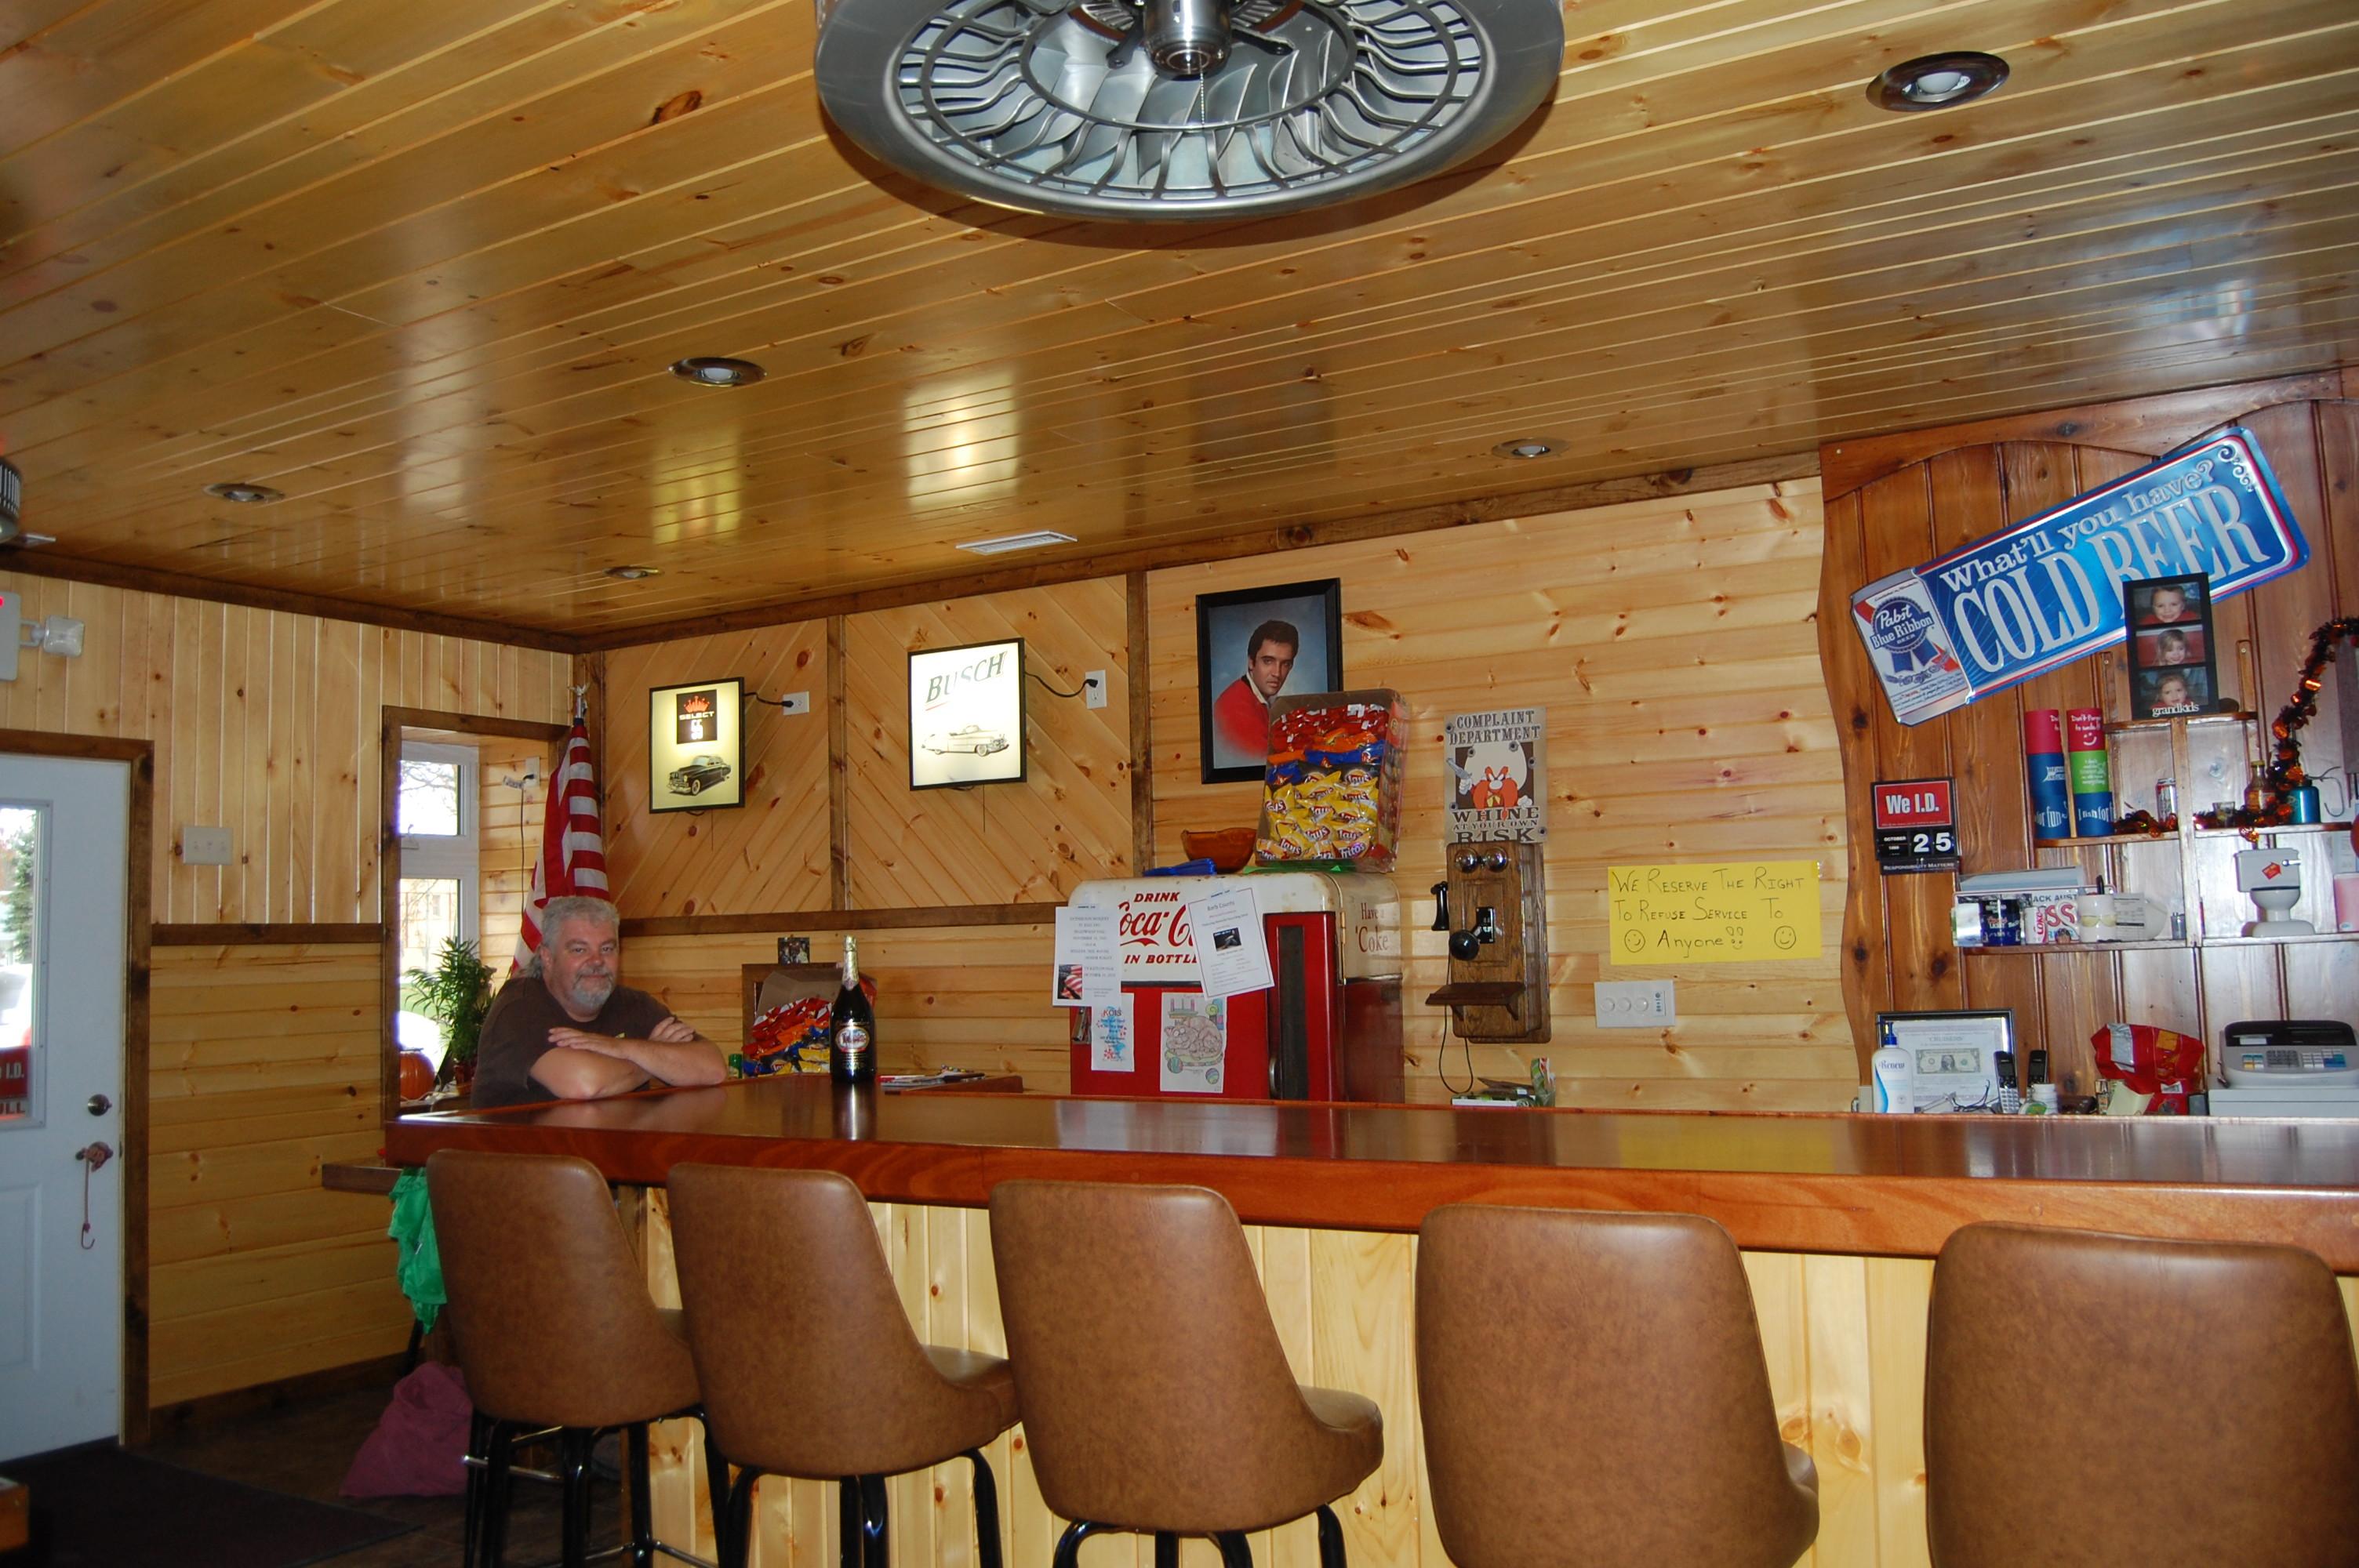 Cruisers Bar & Grill, Kahoka MO